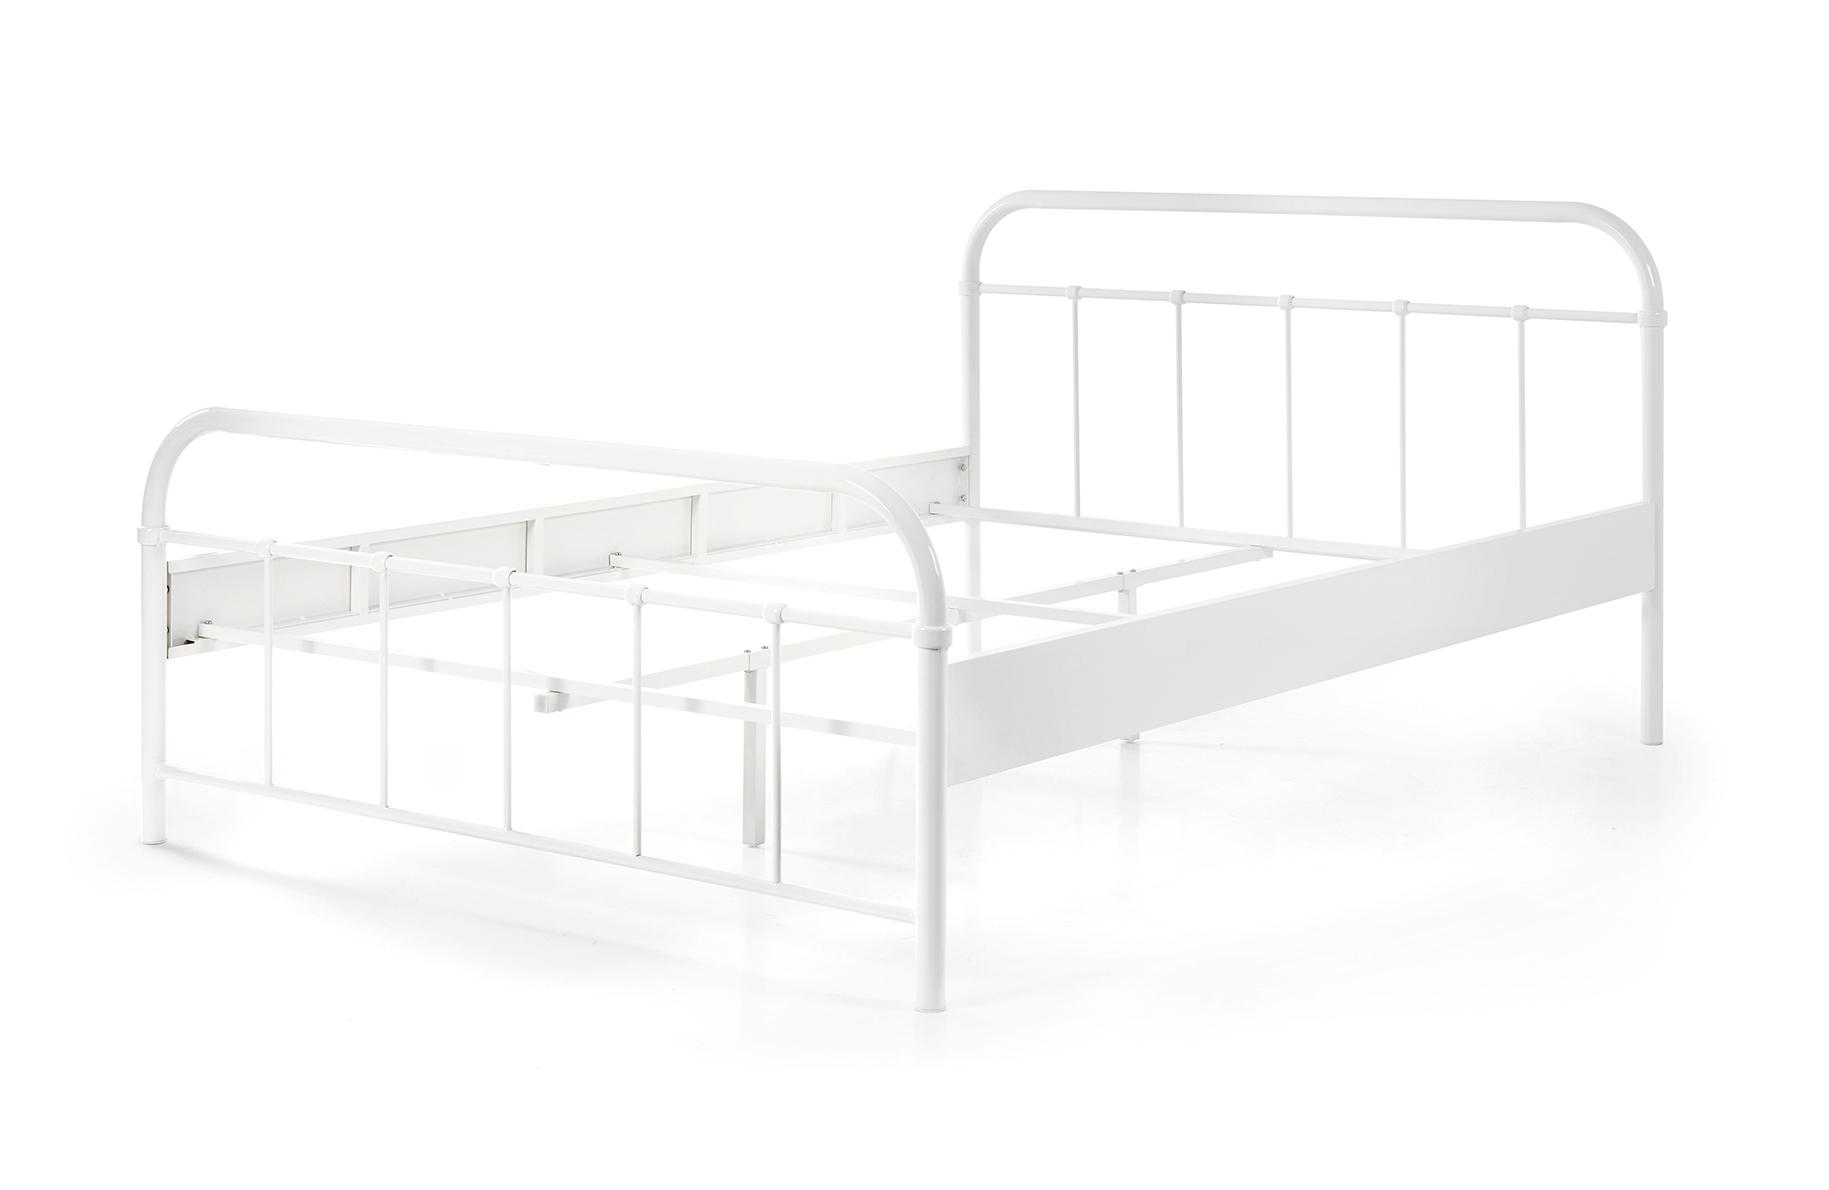 metallbett janek 140 200 wei einzelbetten metallbetten. Black Bedroom Furniture Sets. Home Design Ideas